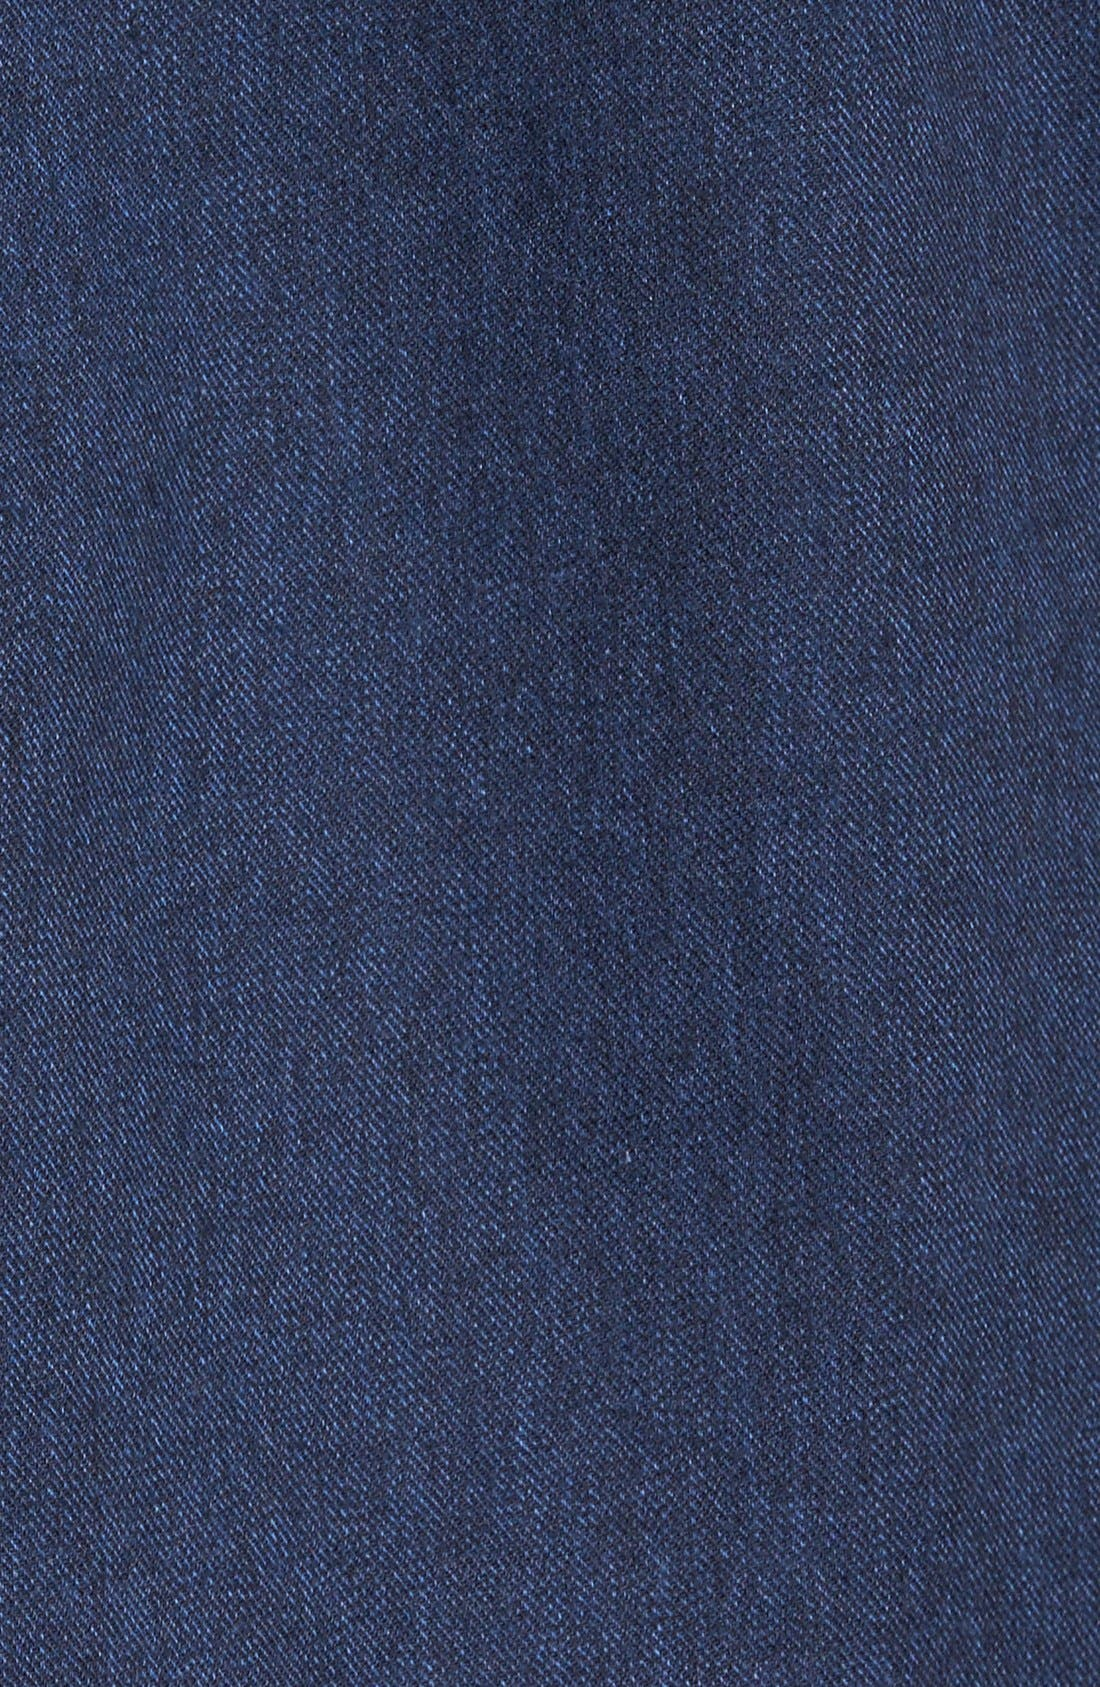 Alternate Image 5  - Rodd & Gunn 'Sinclair' Trim Fit Brushed Twill Sport Shirt